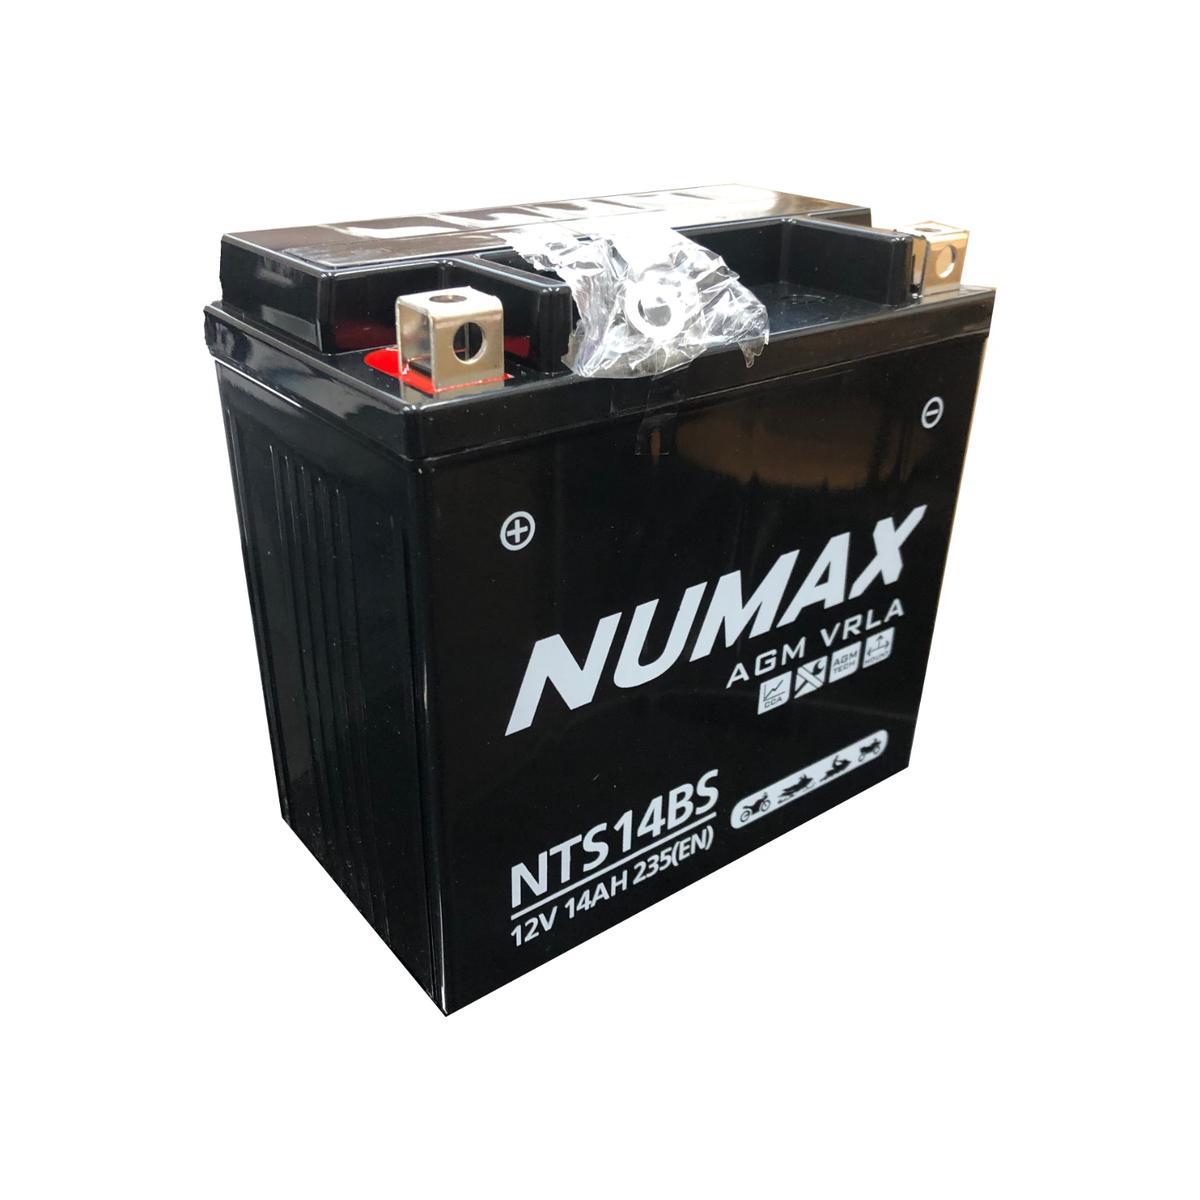 Numax NTS14BS 12v Motorbike Bike Battery HONDA 1500cc GL1500 Valkyrie YTX14-4